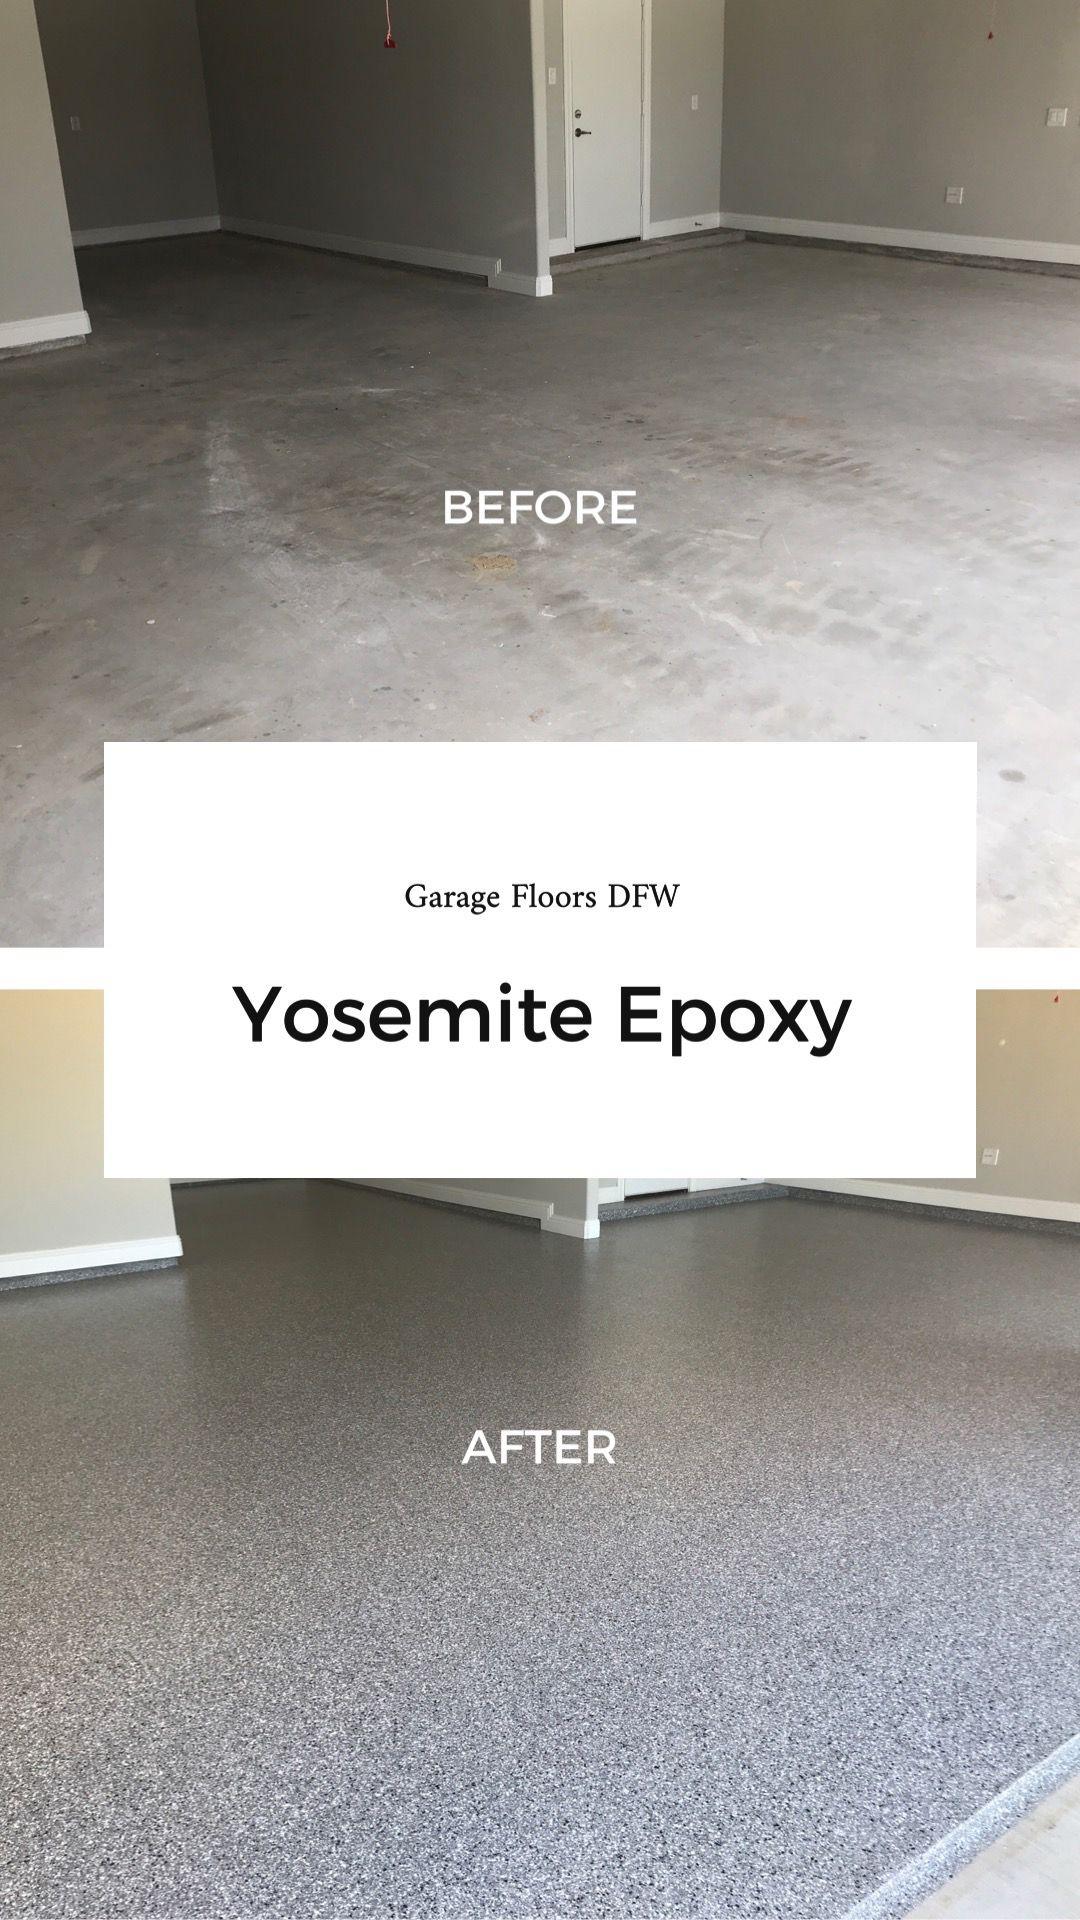 Yosemite Epoxy Flooring Dfw Texas In 2020 Epoxy Floor Flooring Garage Floor Epoxy